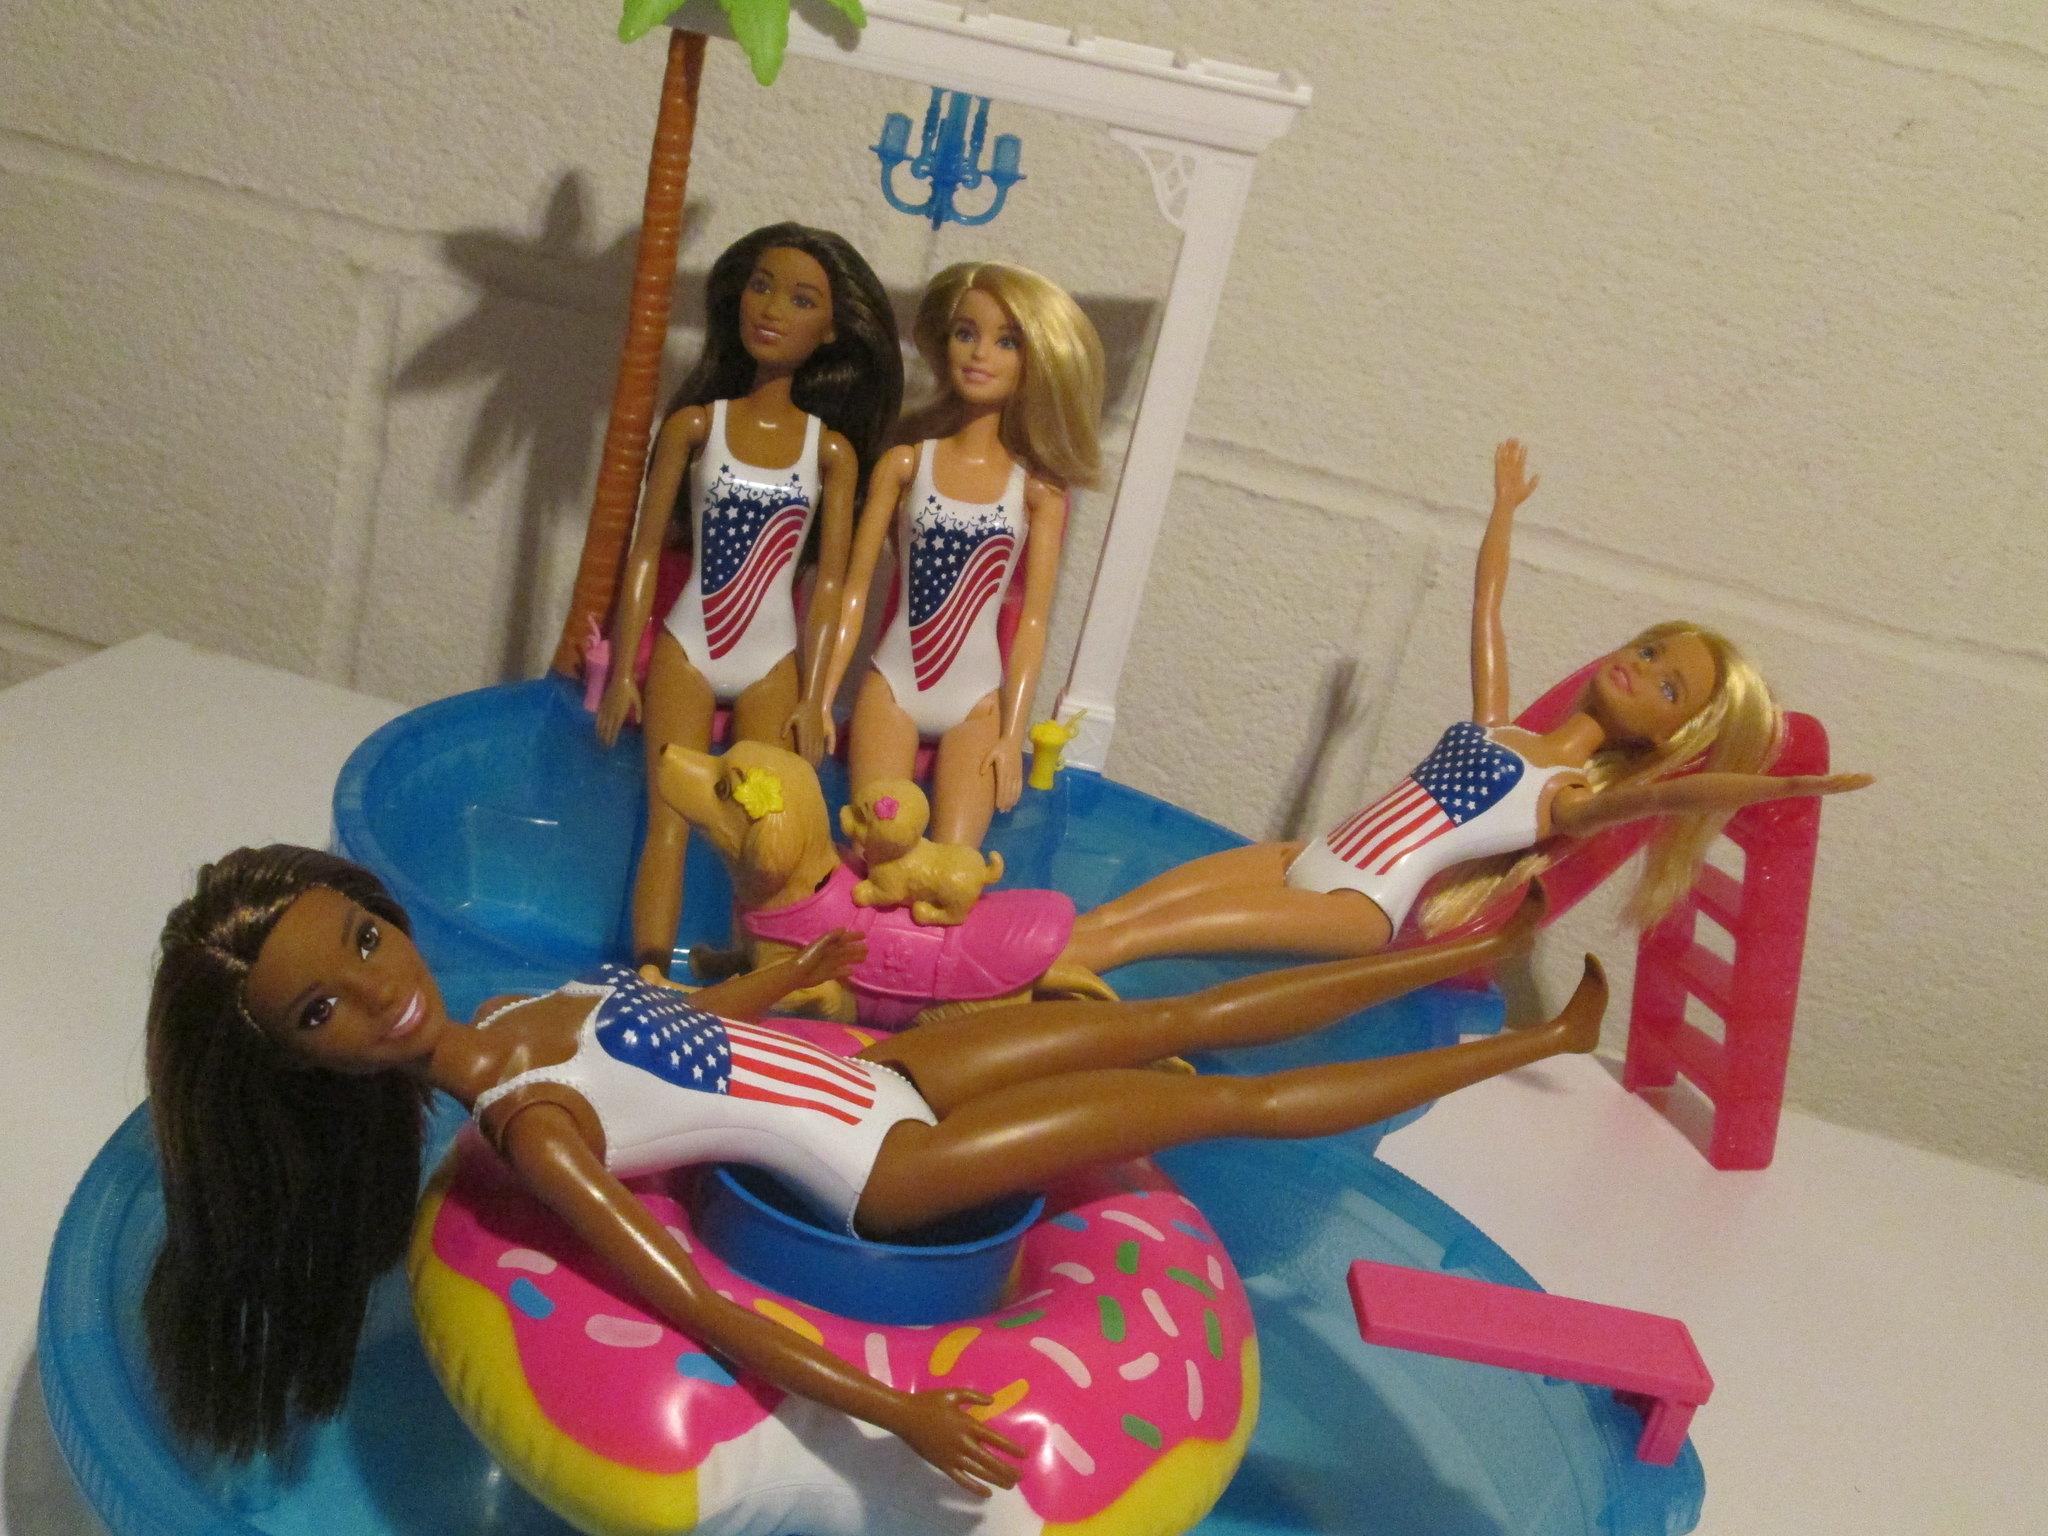 2015 boxdate USA dolls vs 2019 boxdate USA dolls 2019 girls have upgraded shoulder and neck poseability